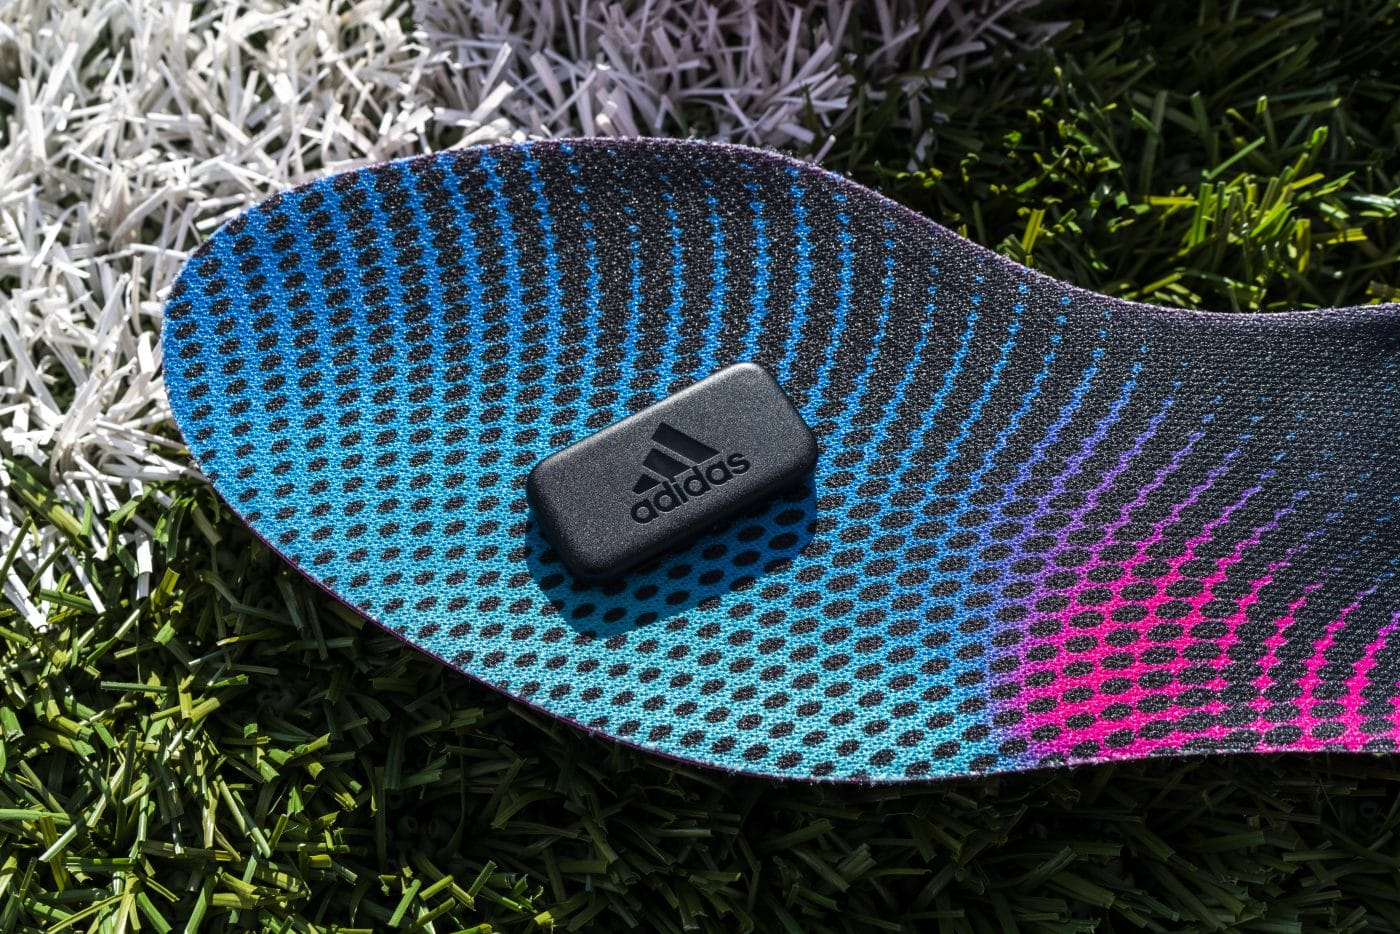 adidas-GMR-semelle-chaussures-de-foot-ea-sports-footpack-7